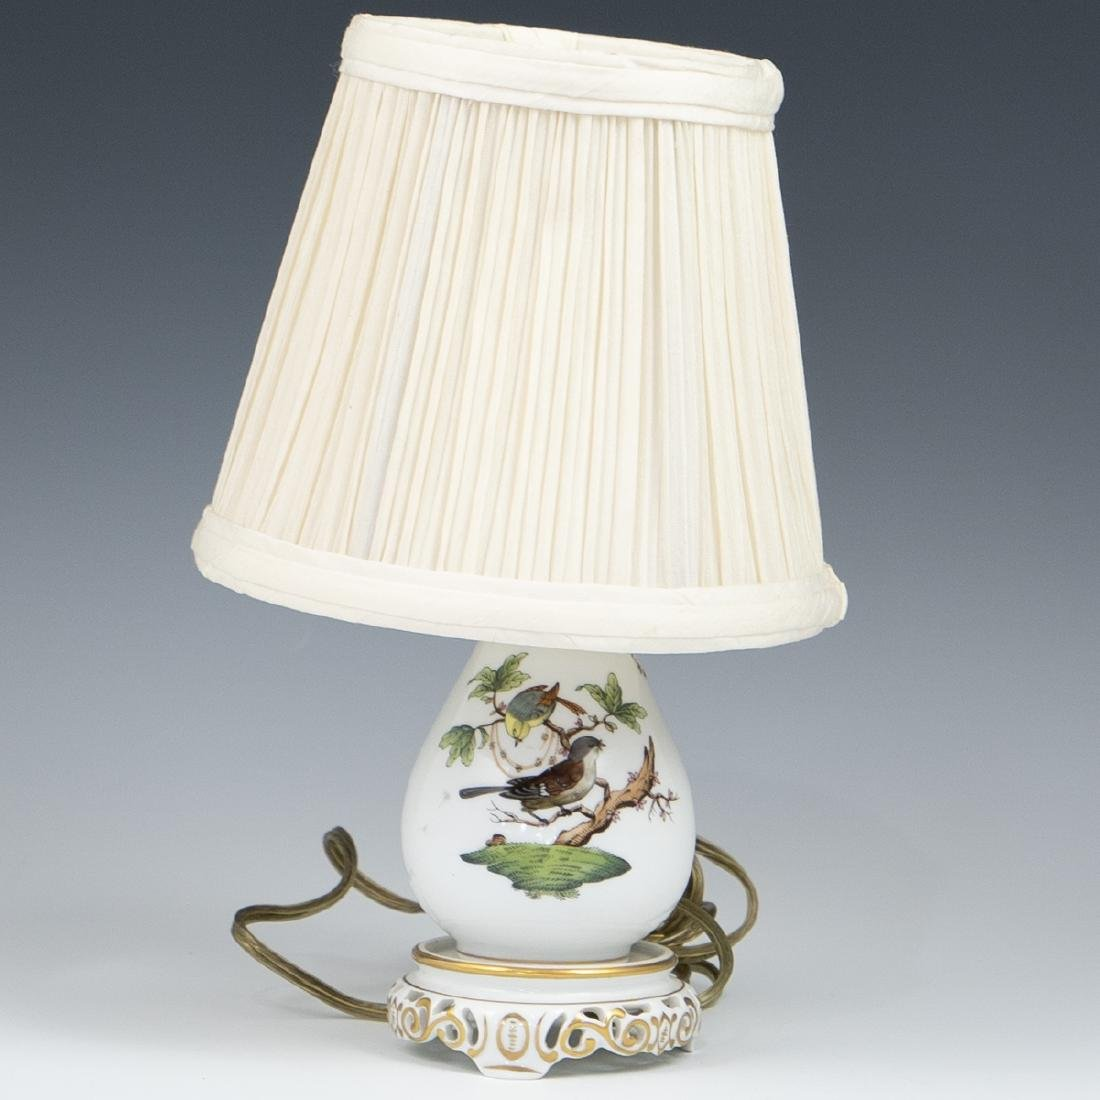 "Herend Porcelain 'Rothschild"" Lamp"